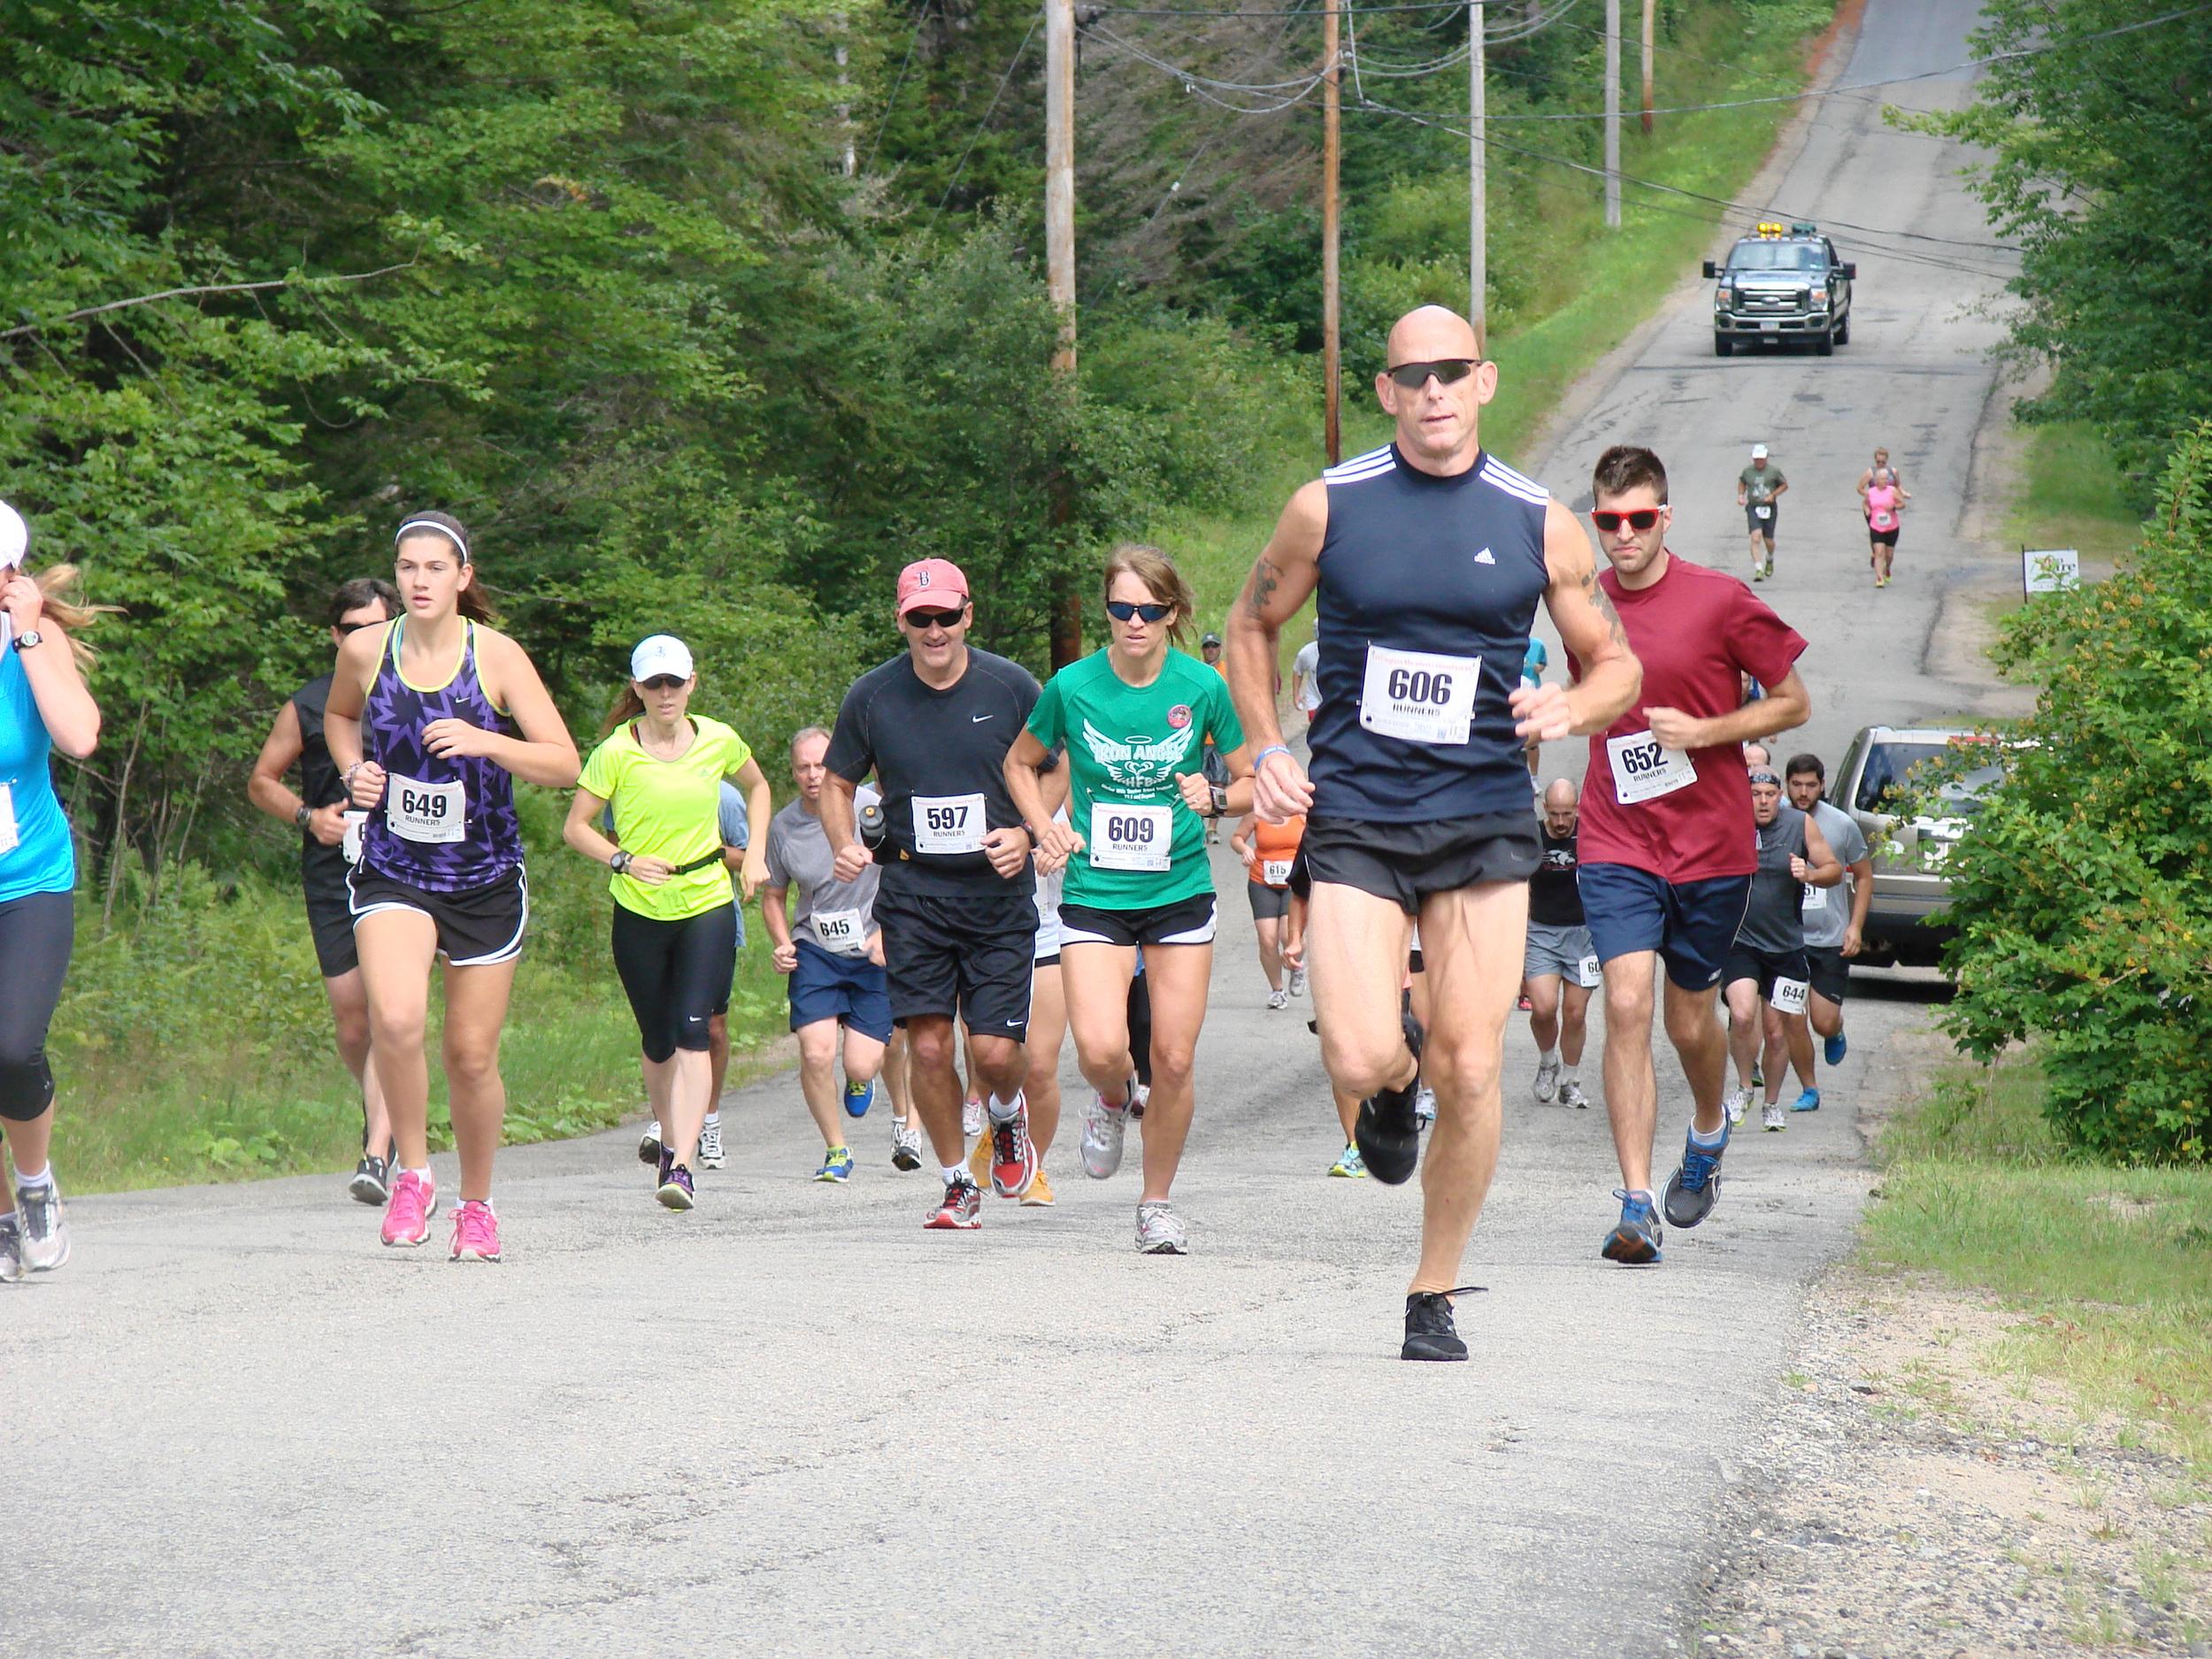 Lane 10K Lake Run road race from Lake Pleasant to Speculator.